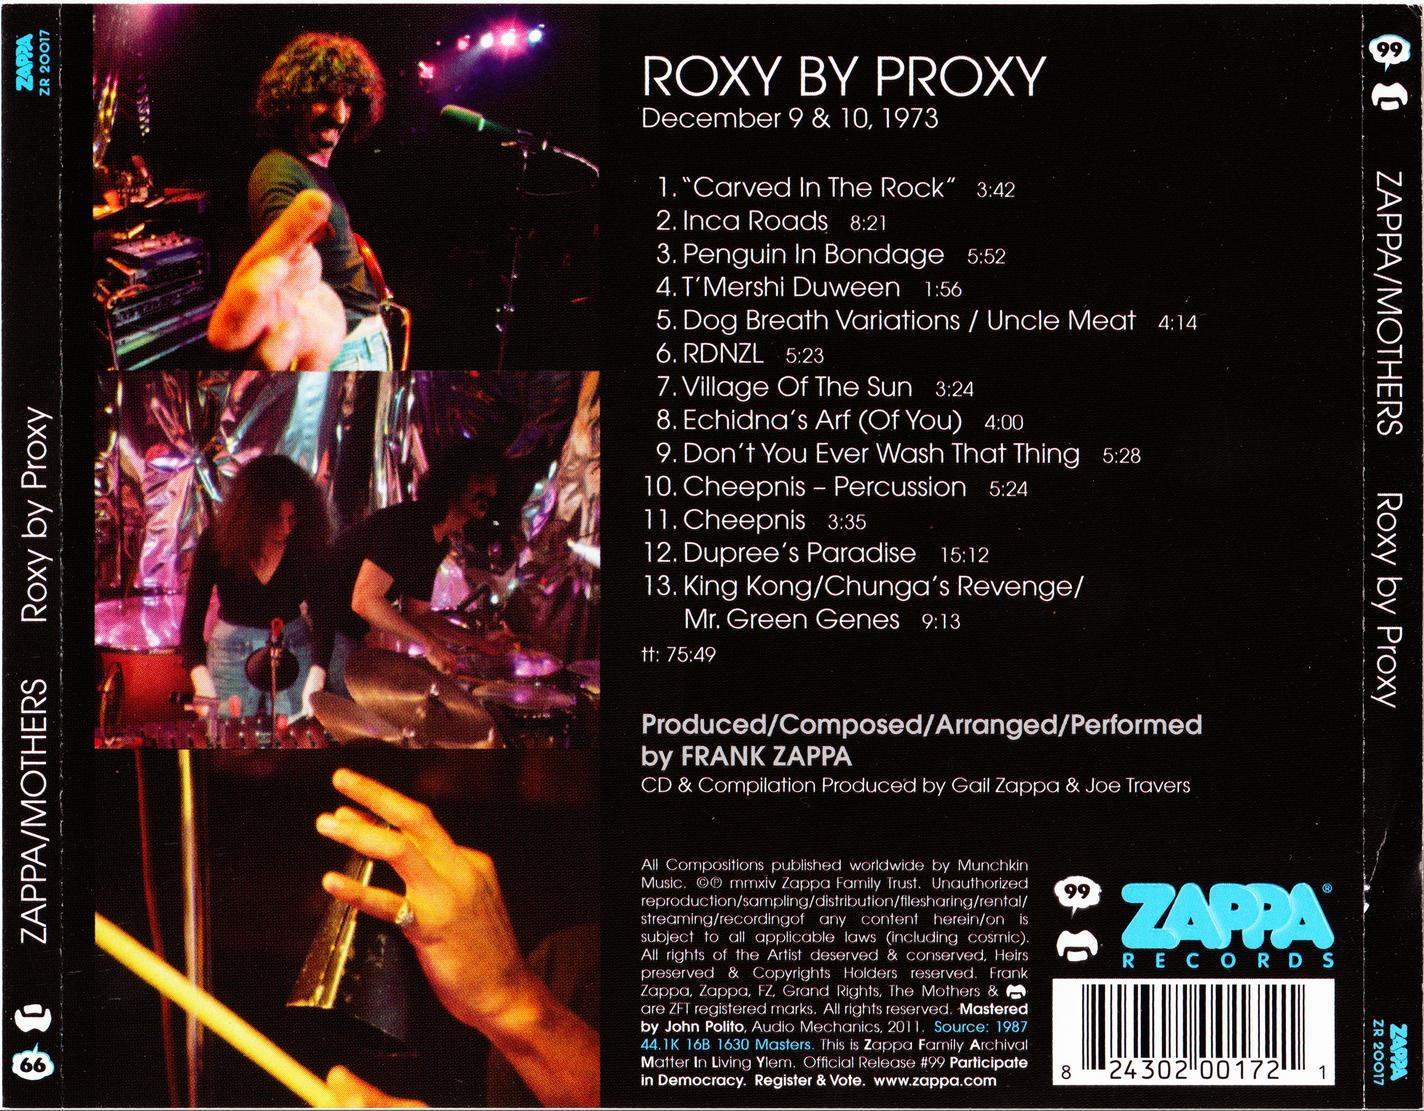 Frank Zappa Amp The Mothers Roxy By Proxy 2014 Zappa